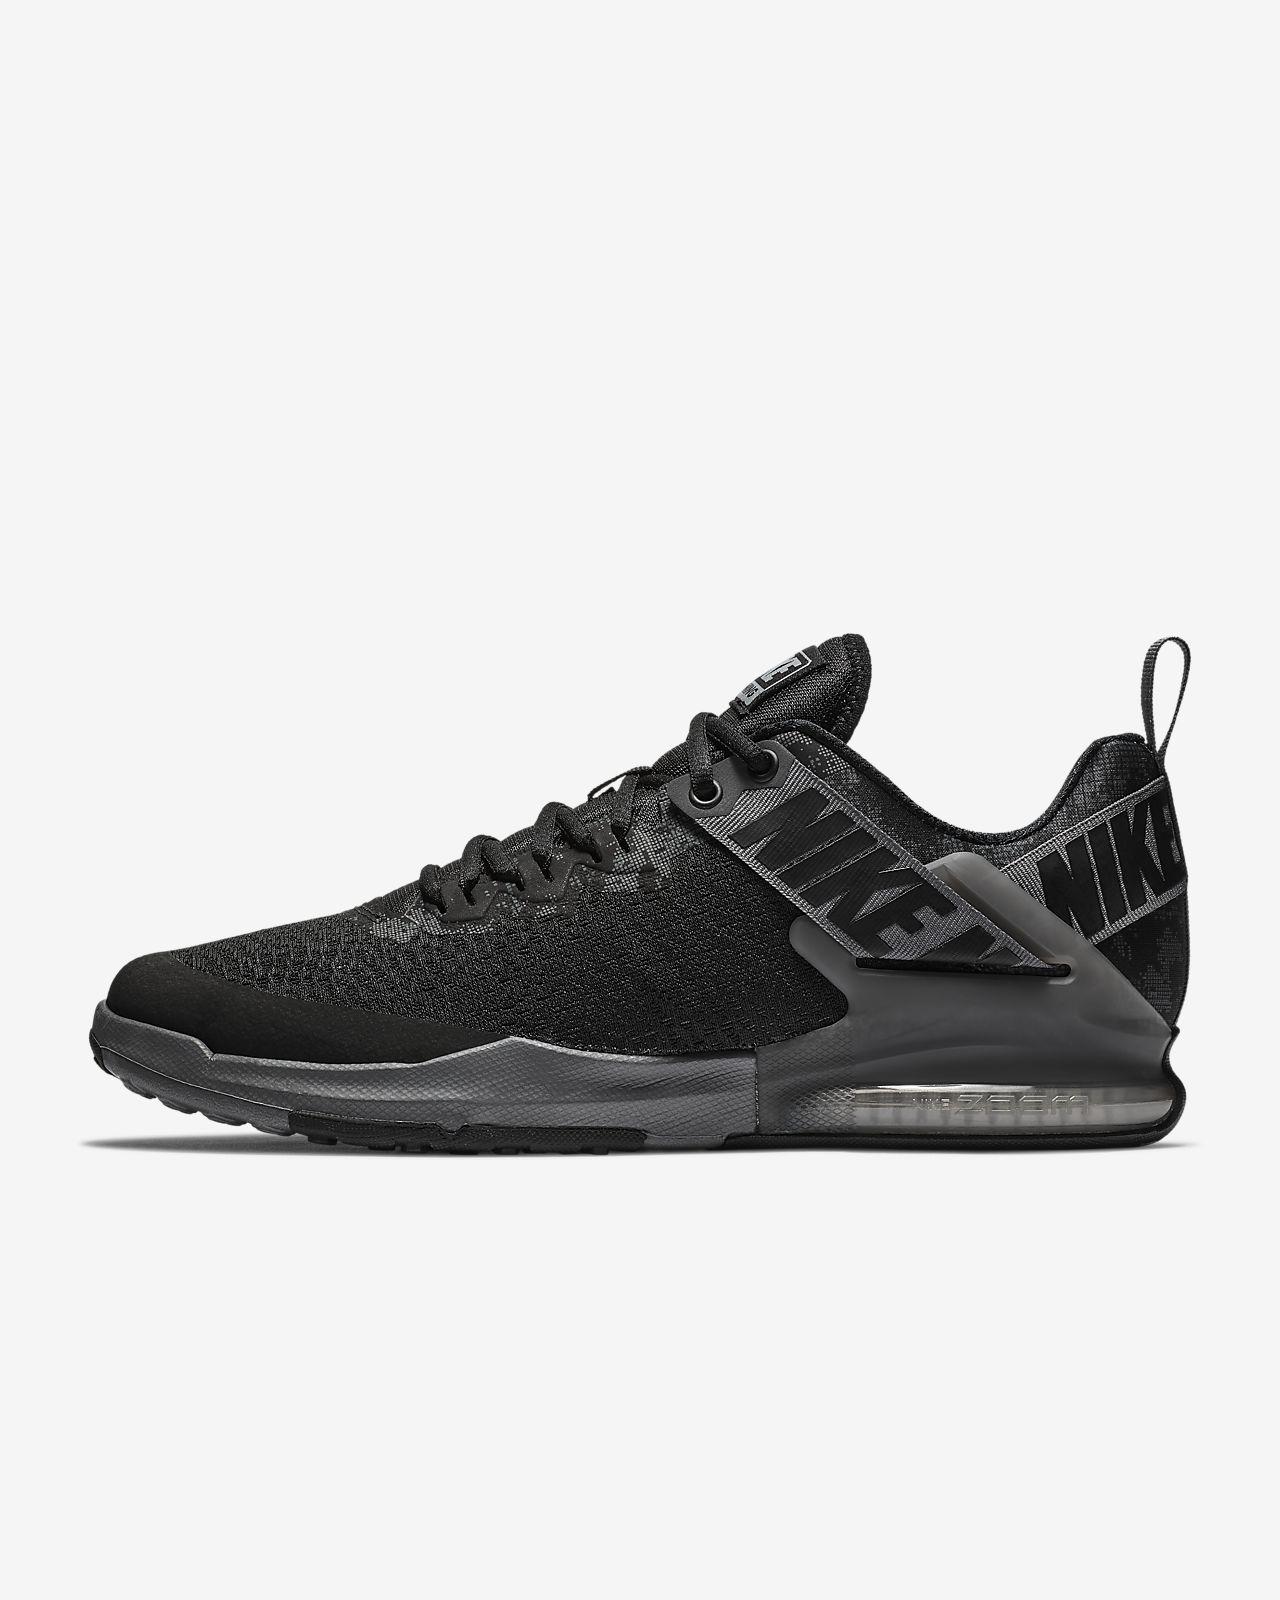 reputable site e1fc7 a9569 ... Nike Zoom Domination TR 2 Mens Training Shoe